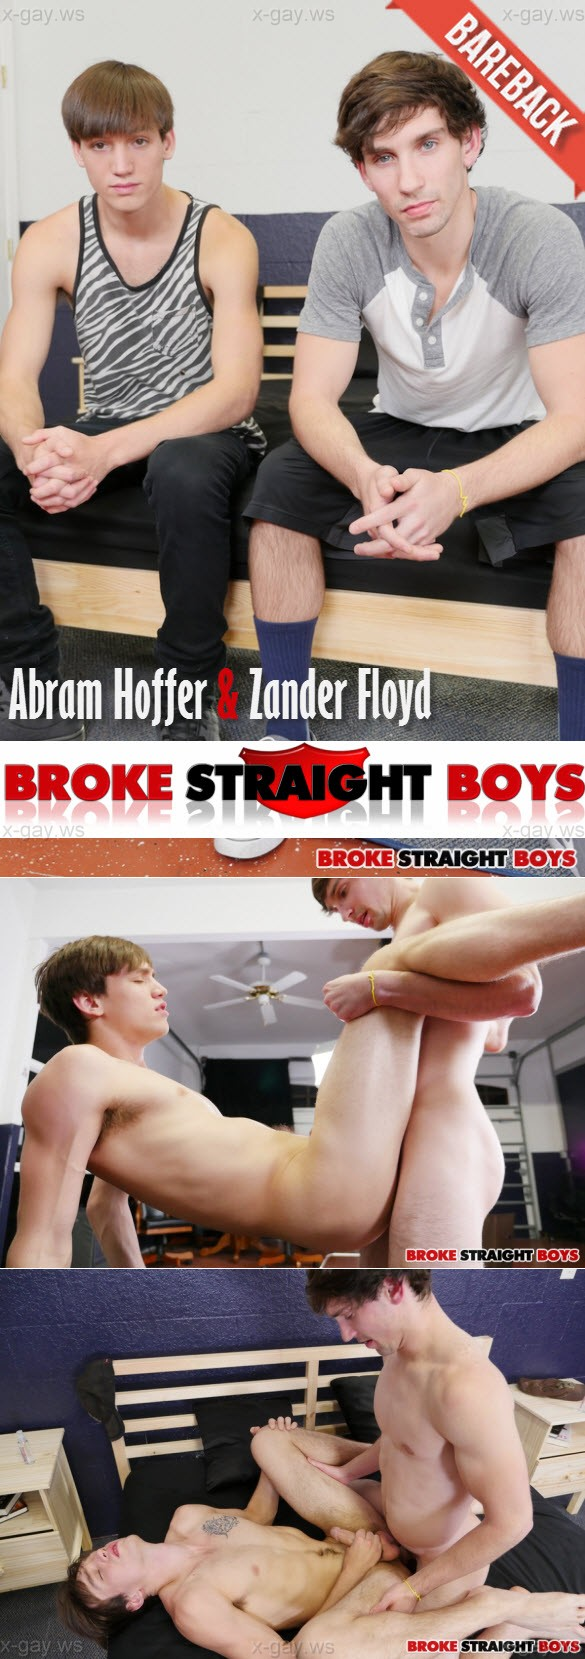 BrokeStraightBoys – Abram Hoffer & Zander Floyd, RAW